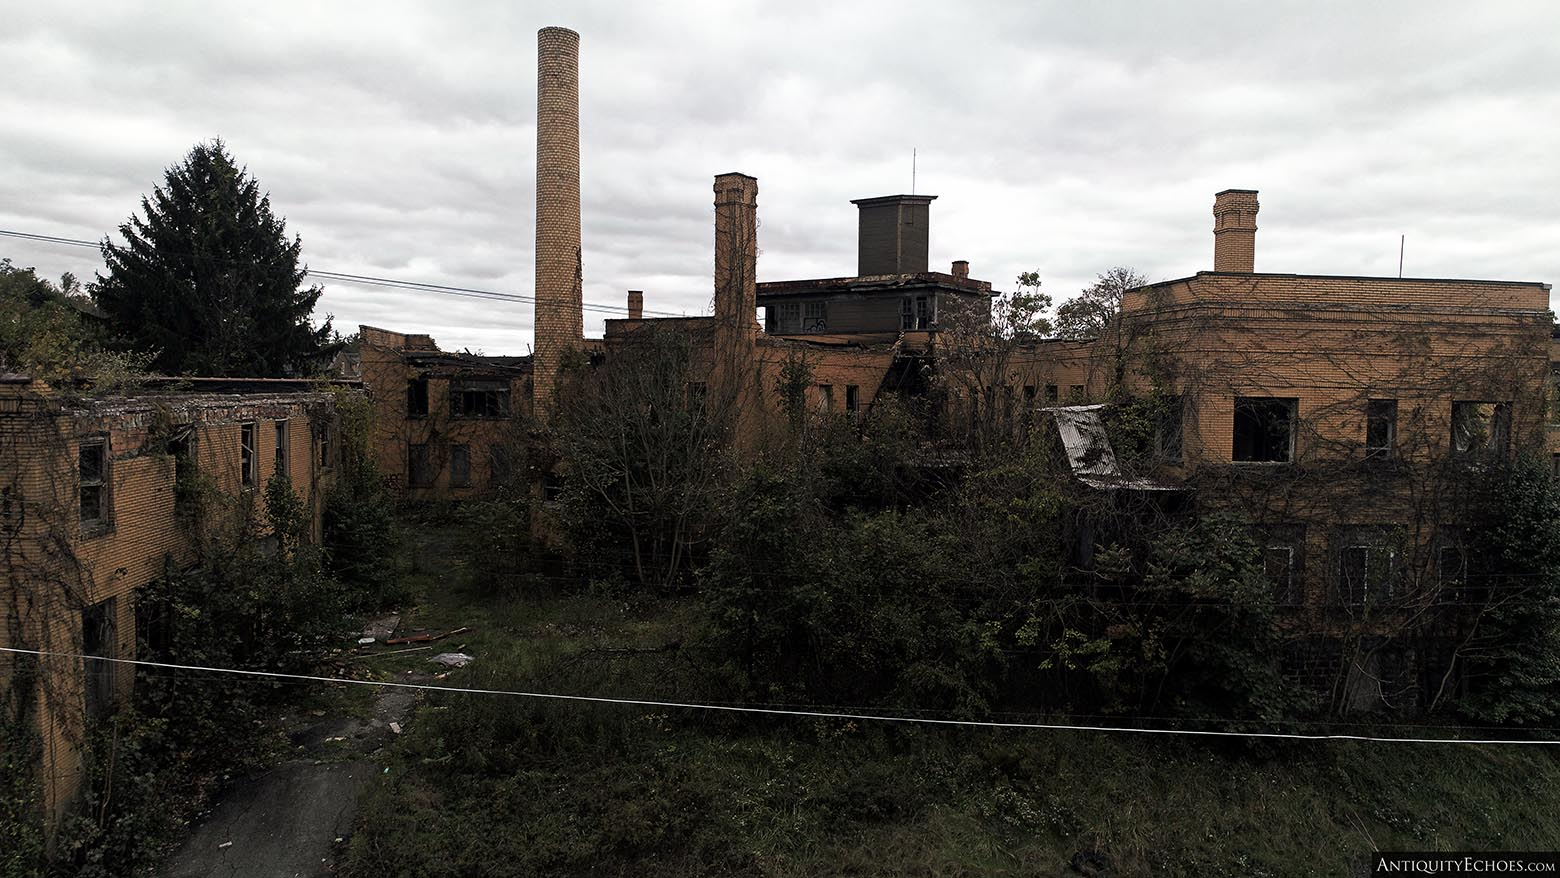 Brownsville General Hospital - Overgrown Property